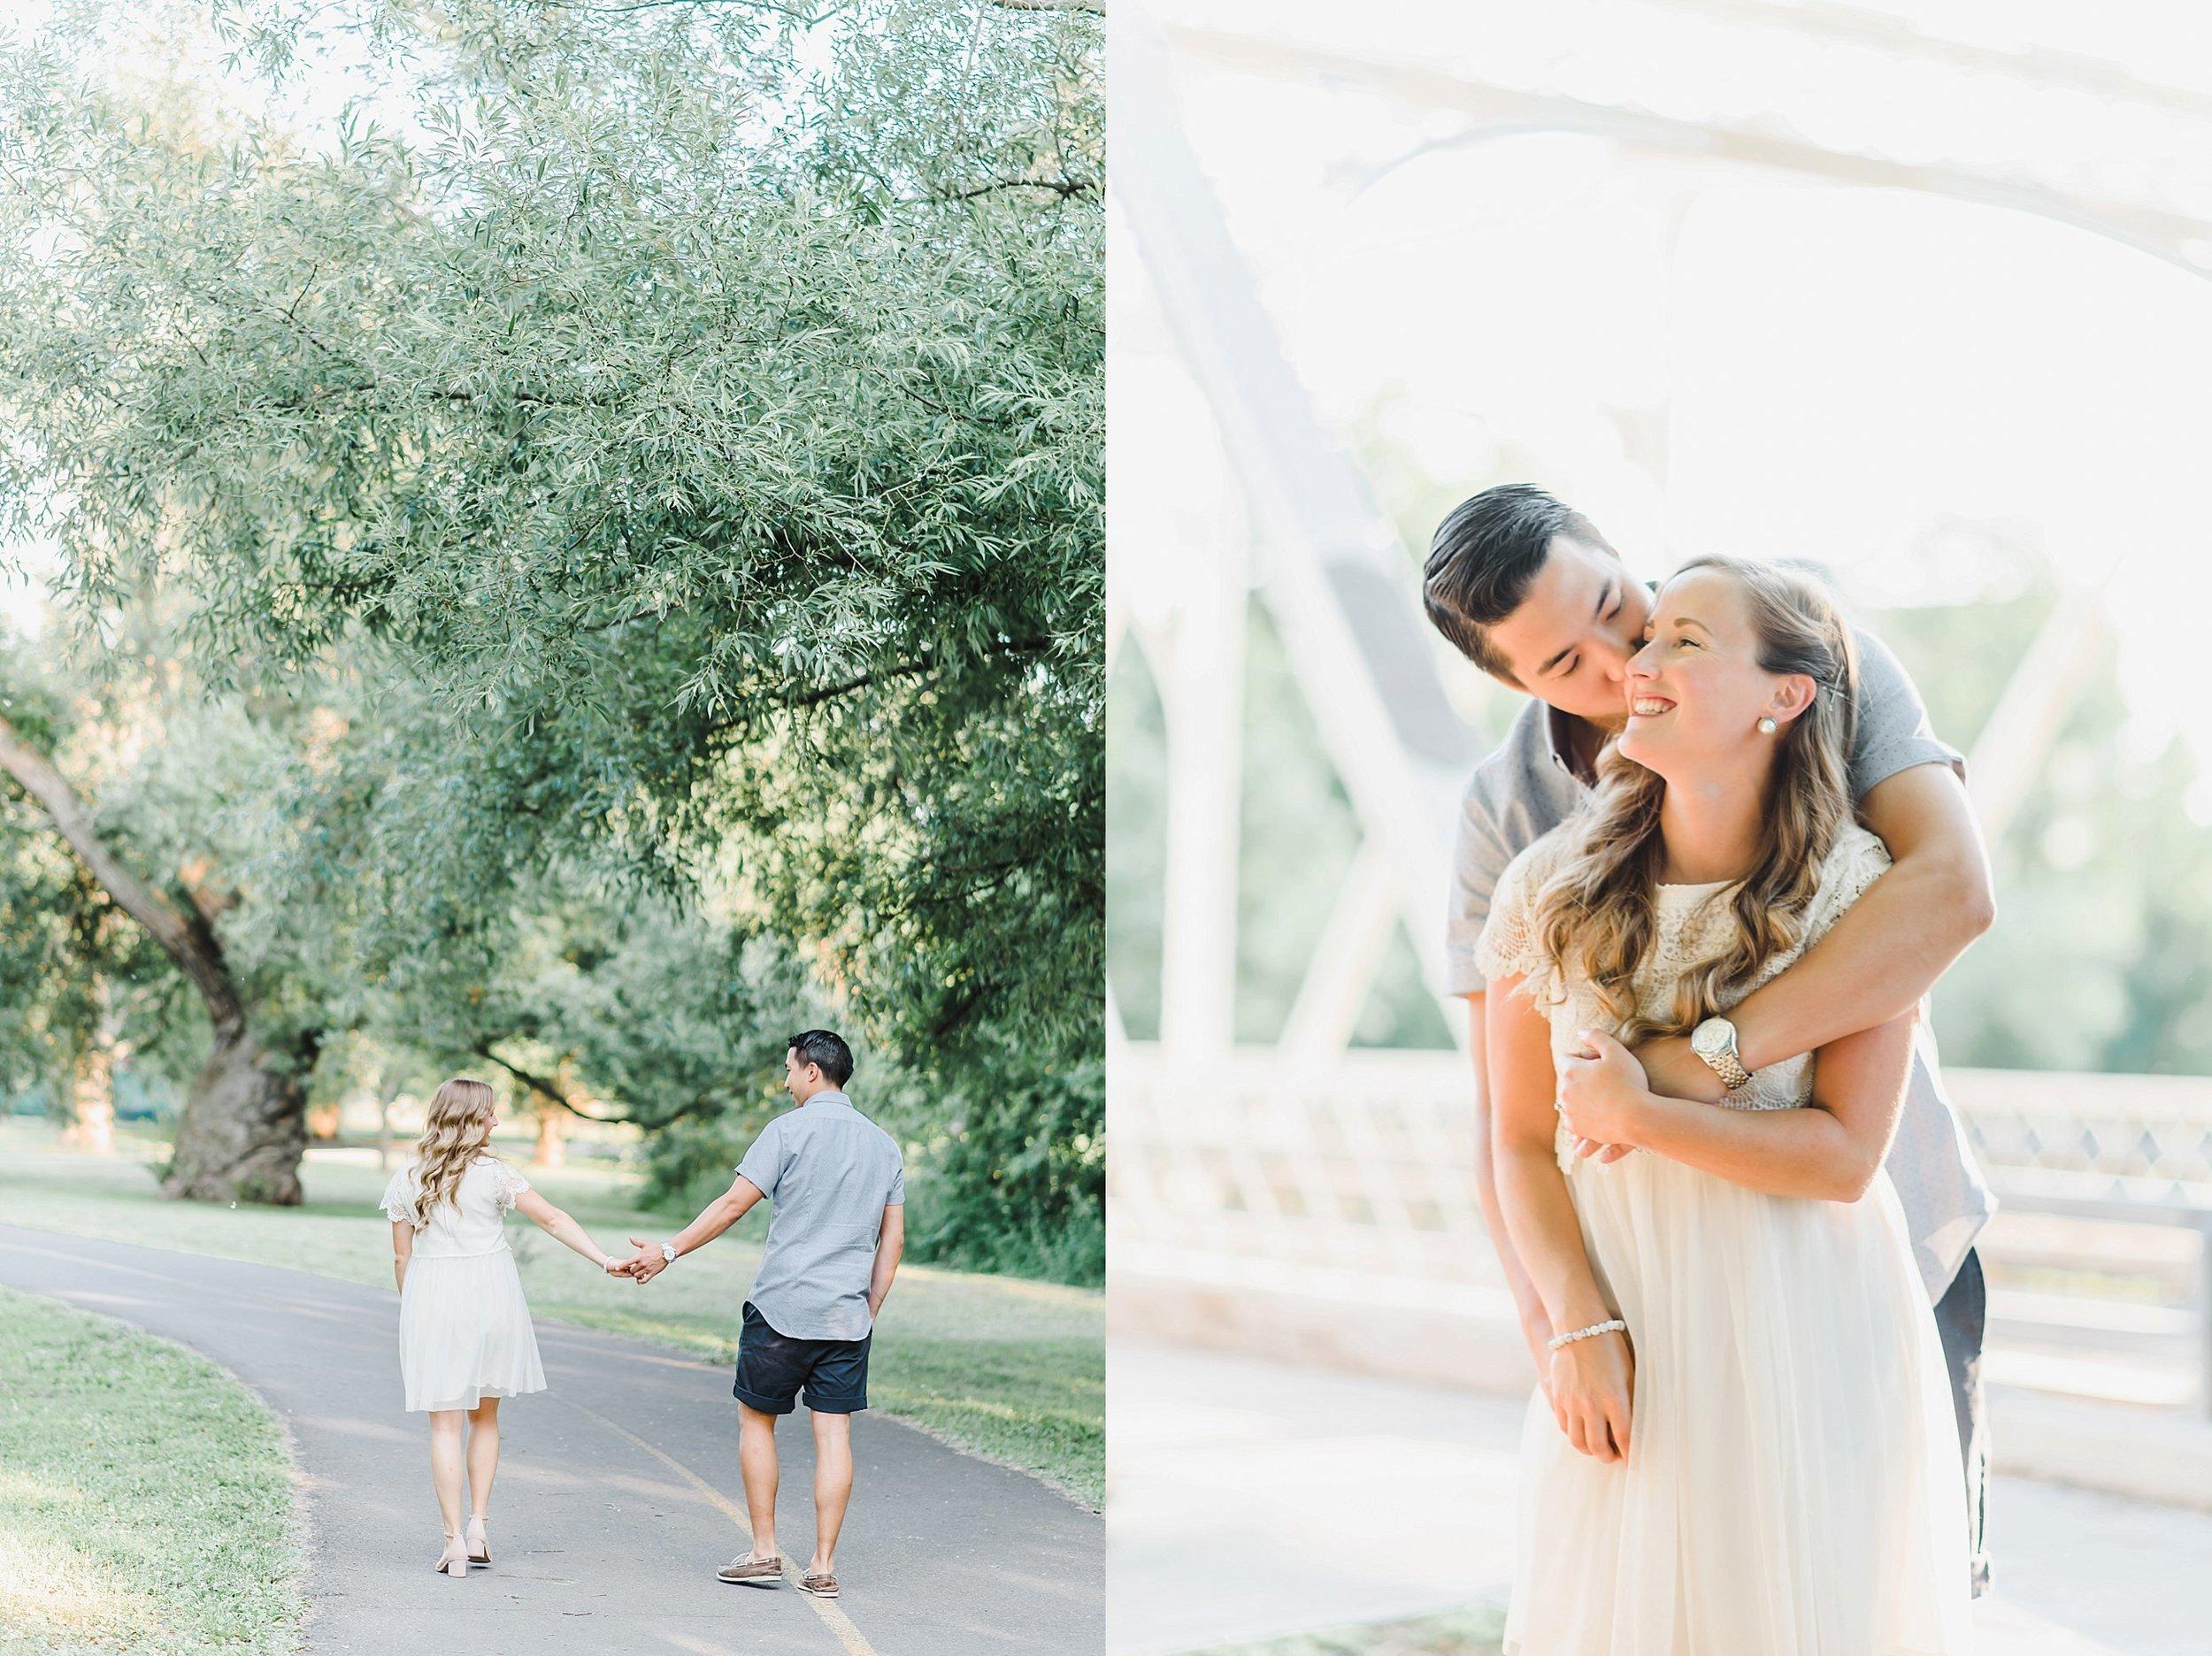 light airy indie fine art ottawa wedding photographer   Ali and Batoul Photography_0245.jpg